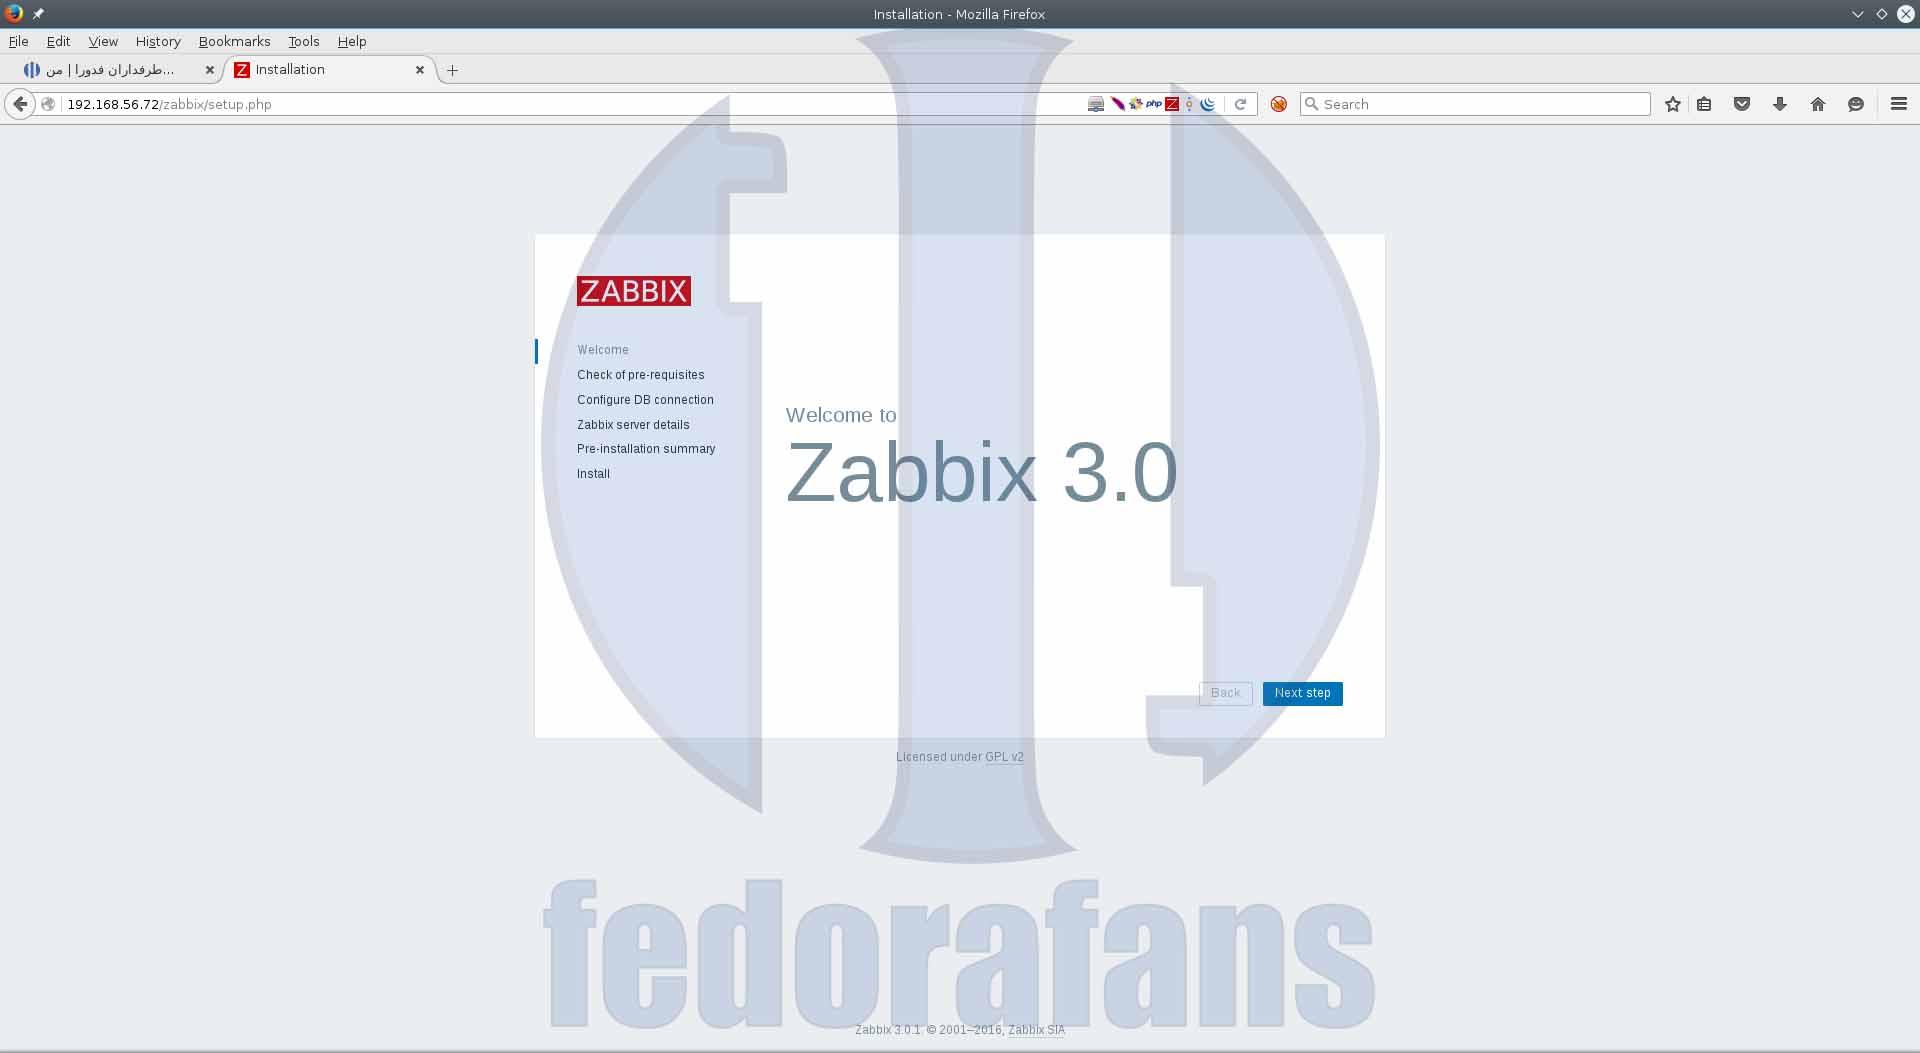 1-zabbix-fedorafans-com